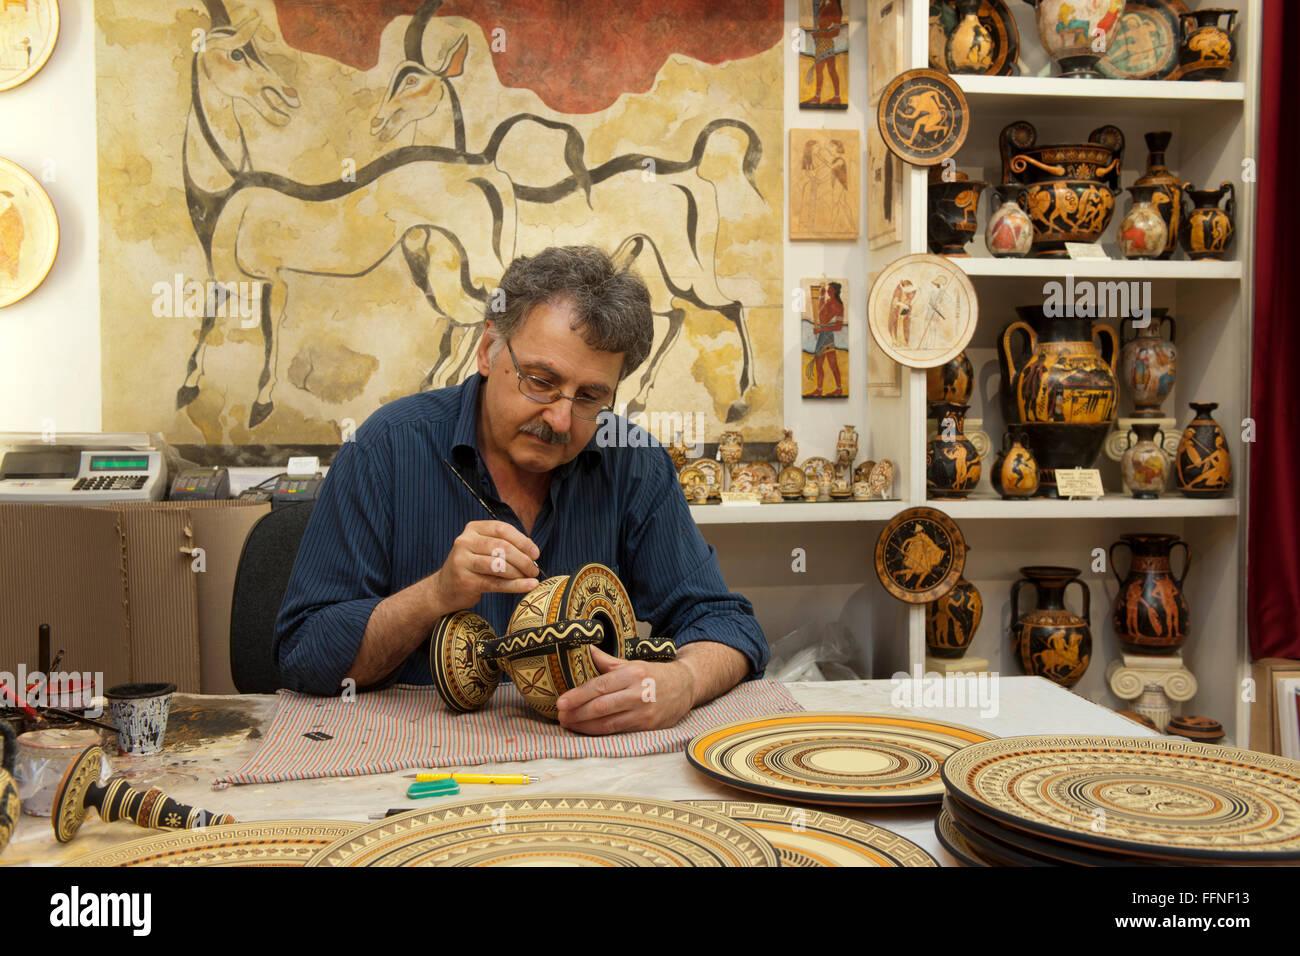 Griechenland, Kreta, Agios Nikolaos, Atelier Ceramica - Stock Image